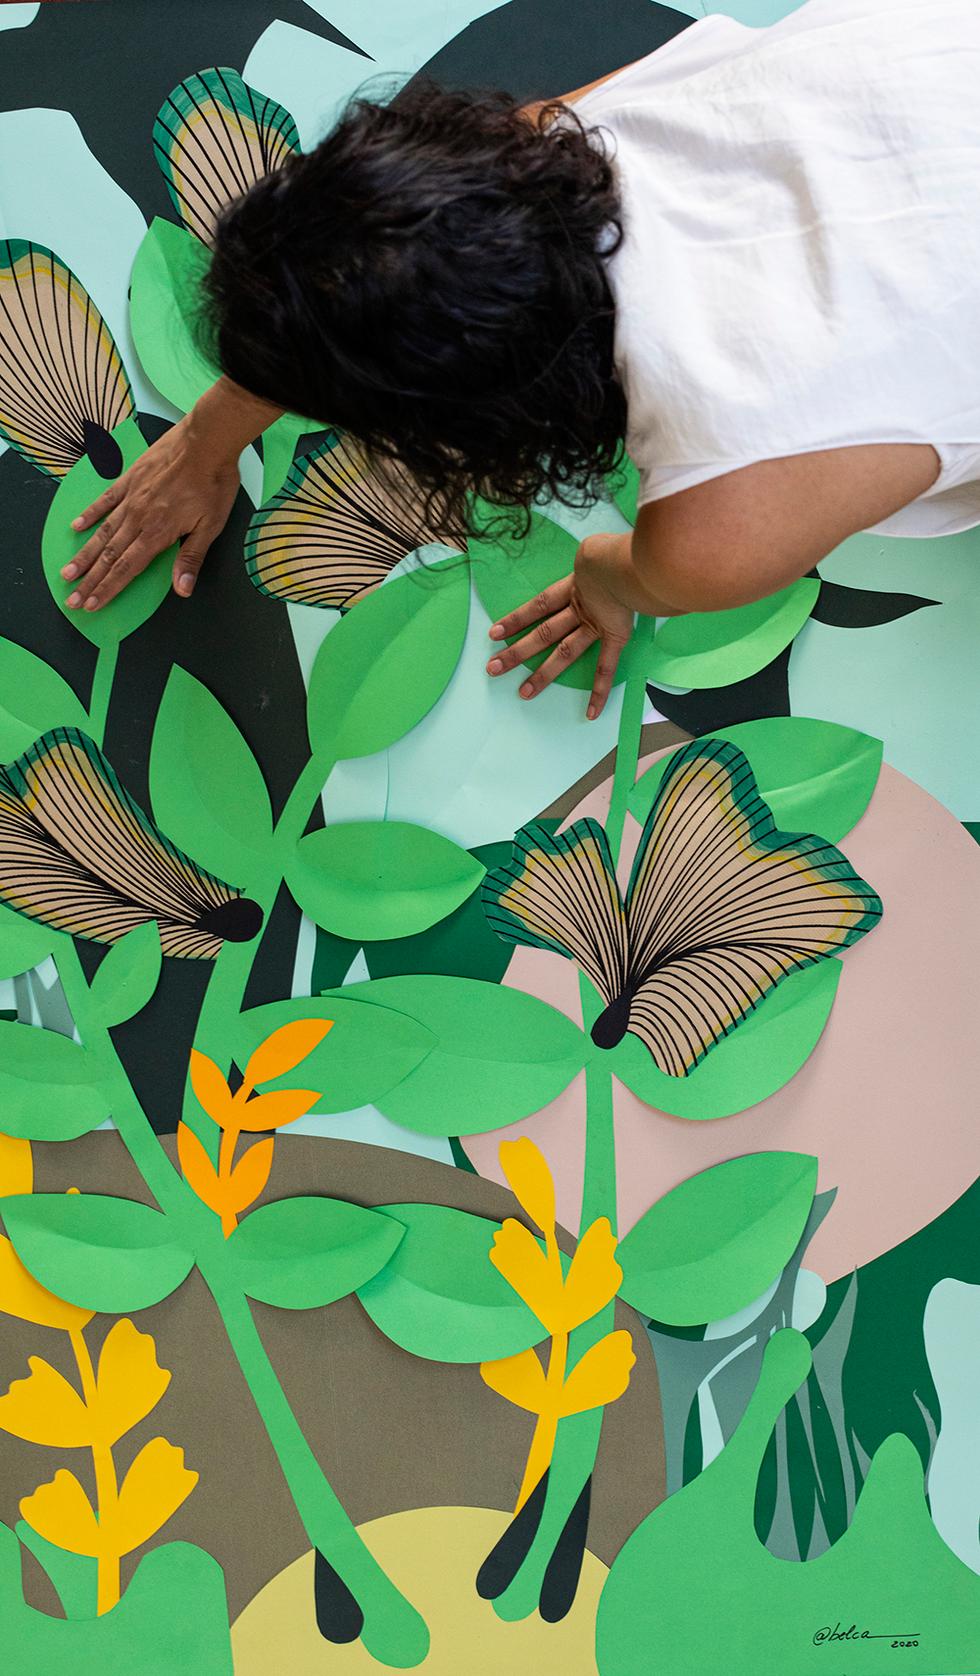 artista-belca-compondo-jardim-vertical